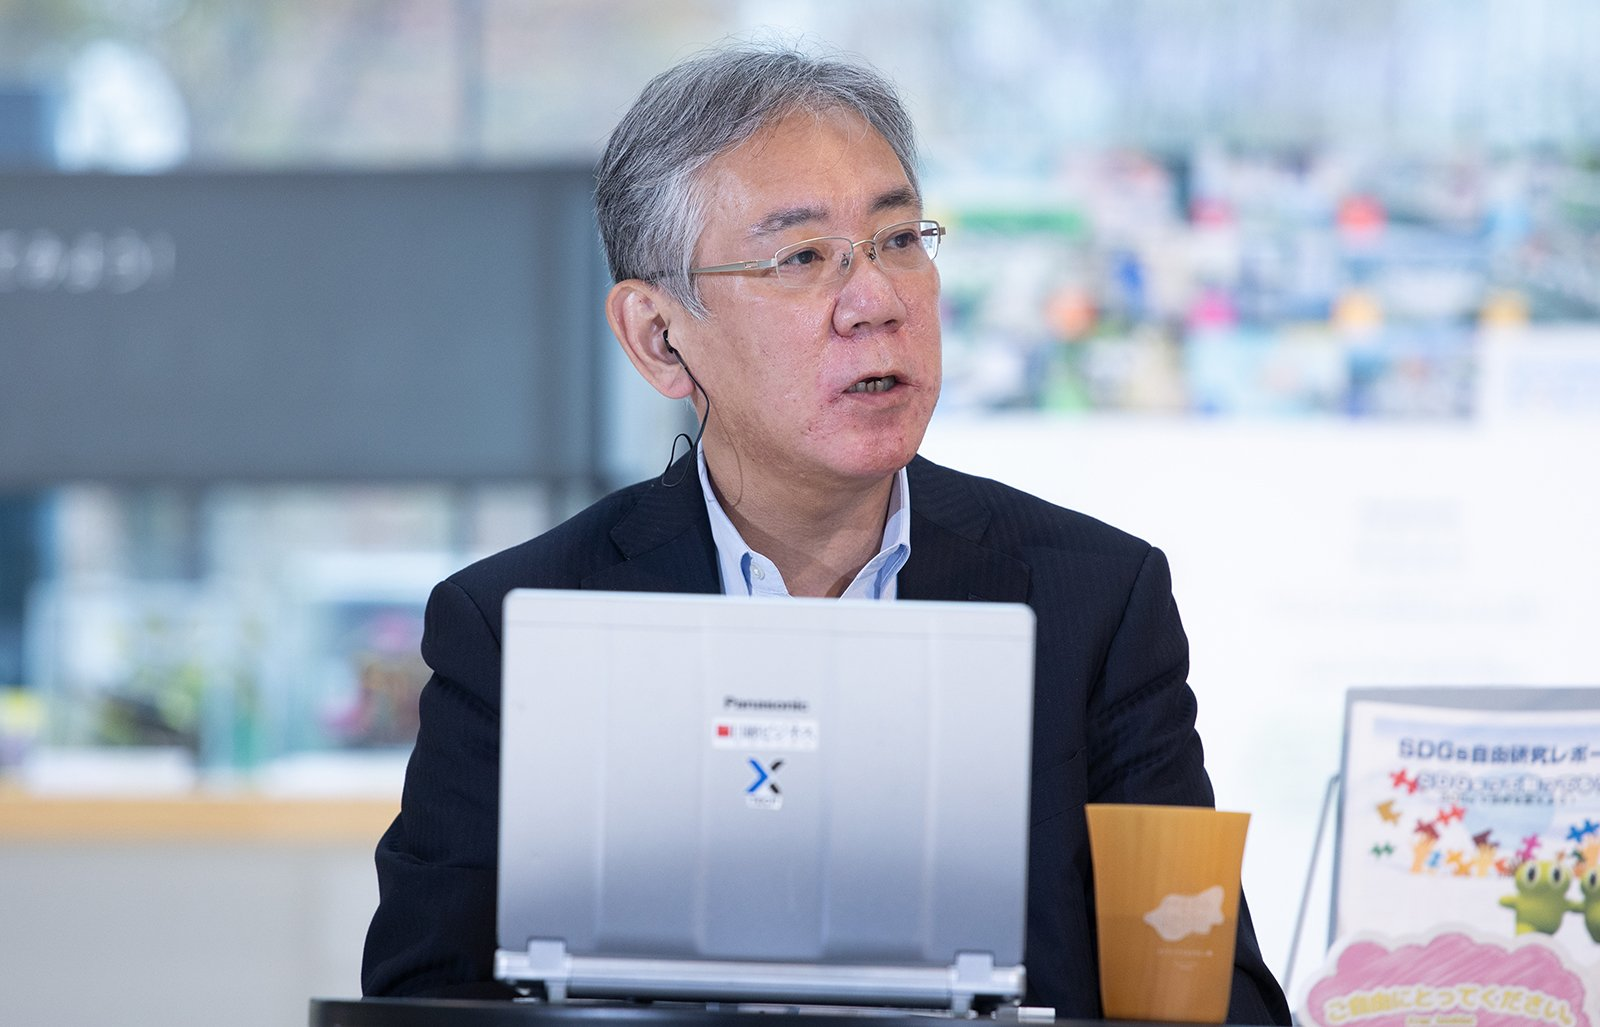 Photo: Shigenori Jinbo, Senior Fellow, Nikkei BP Intelligence Group